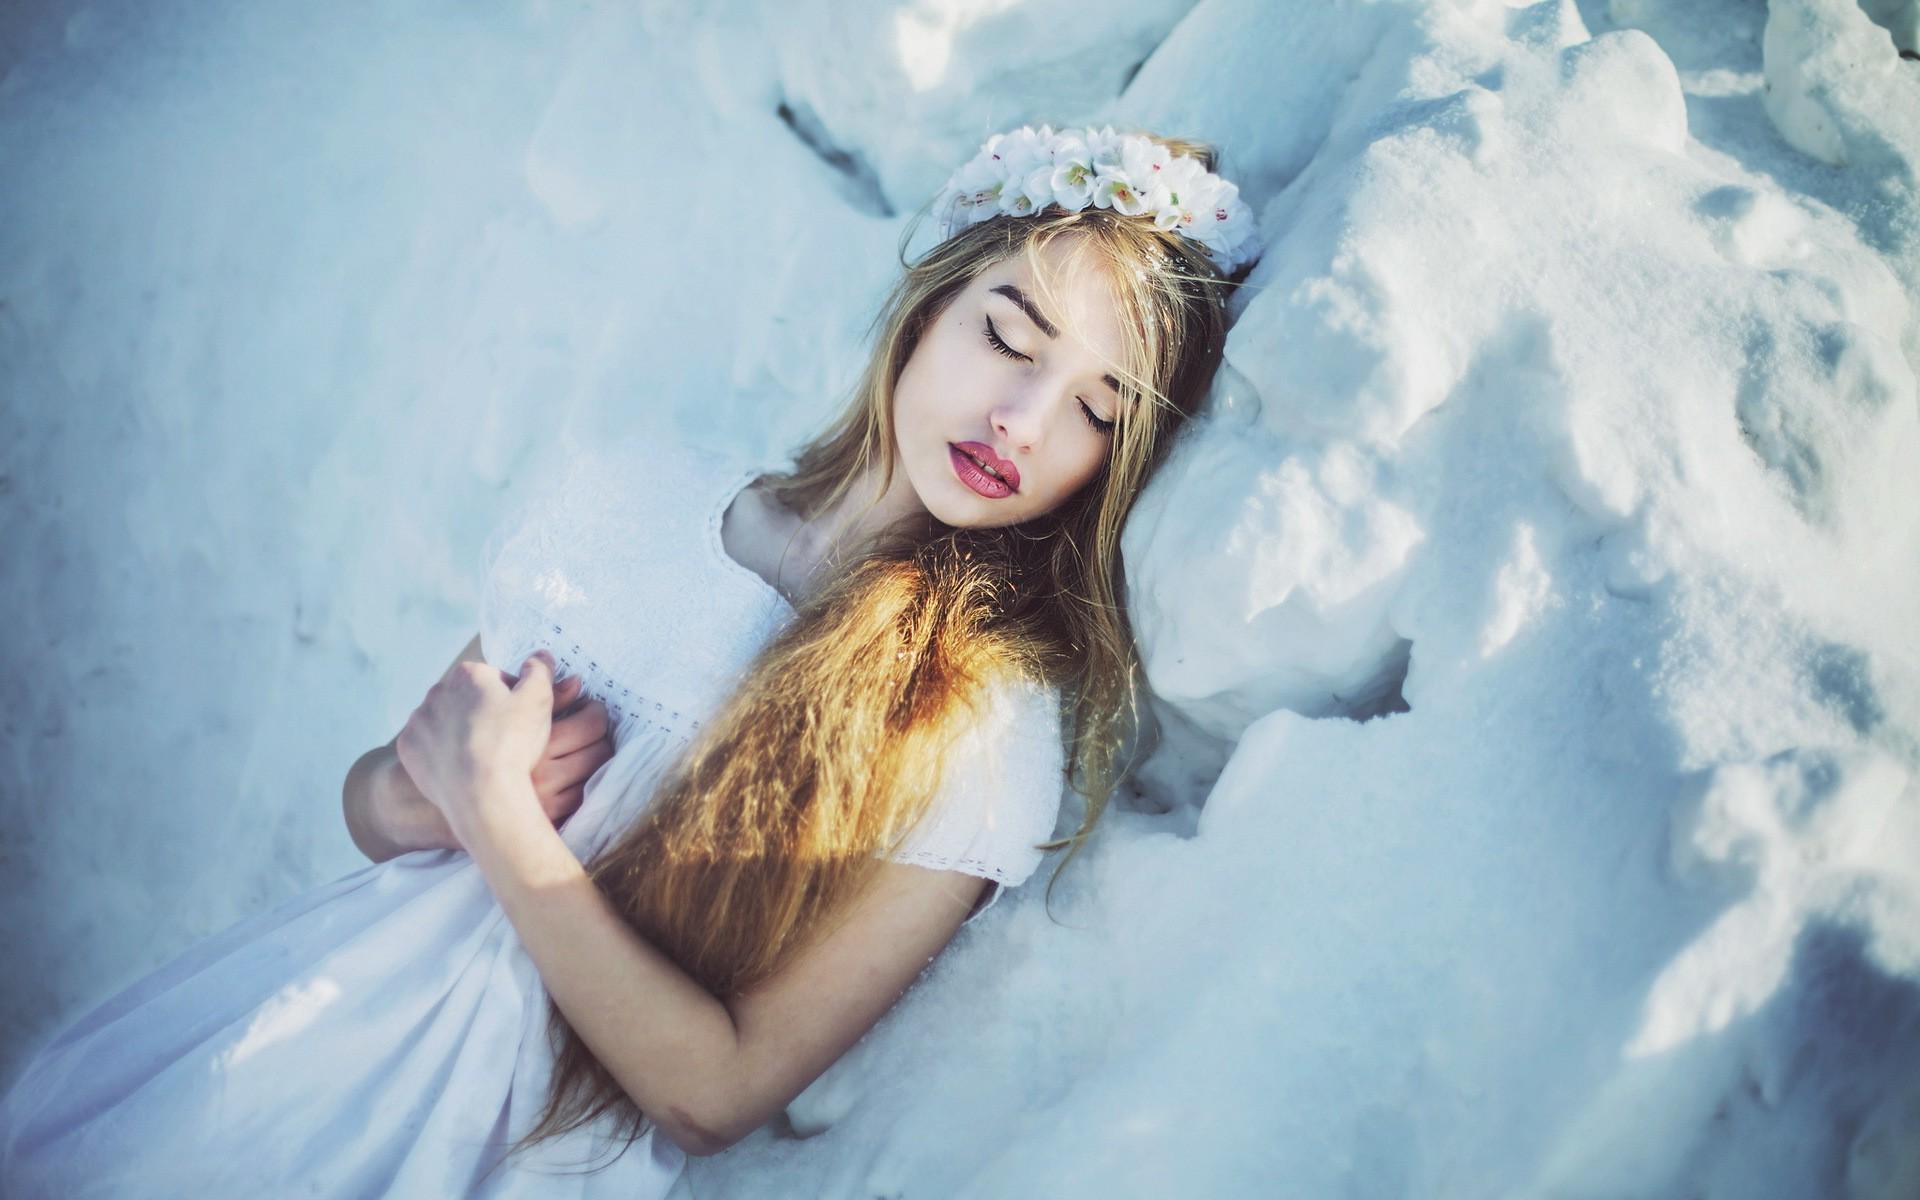 Angel Snow